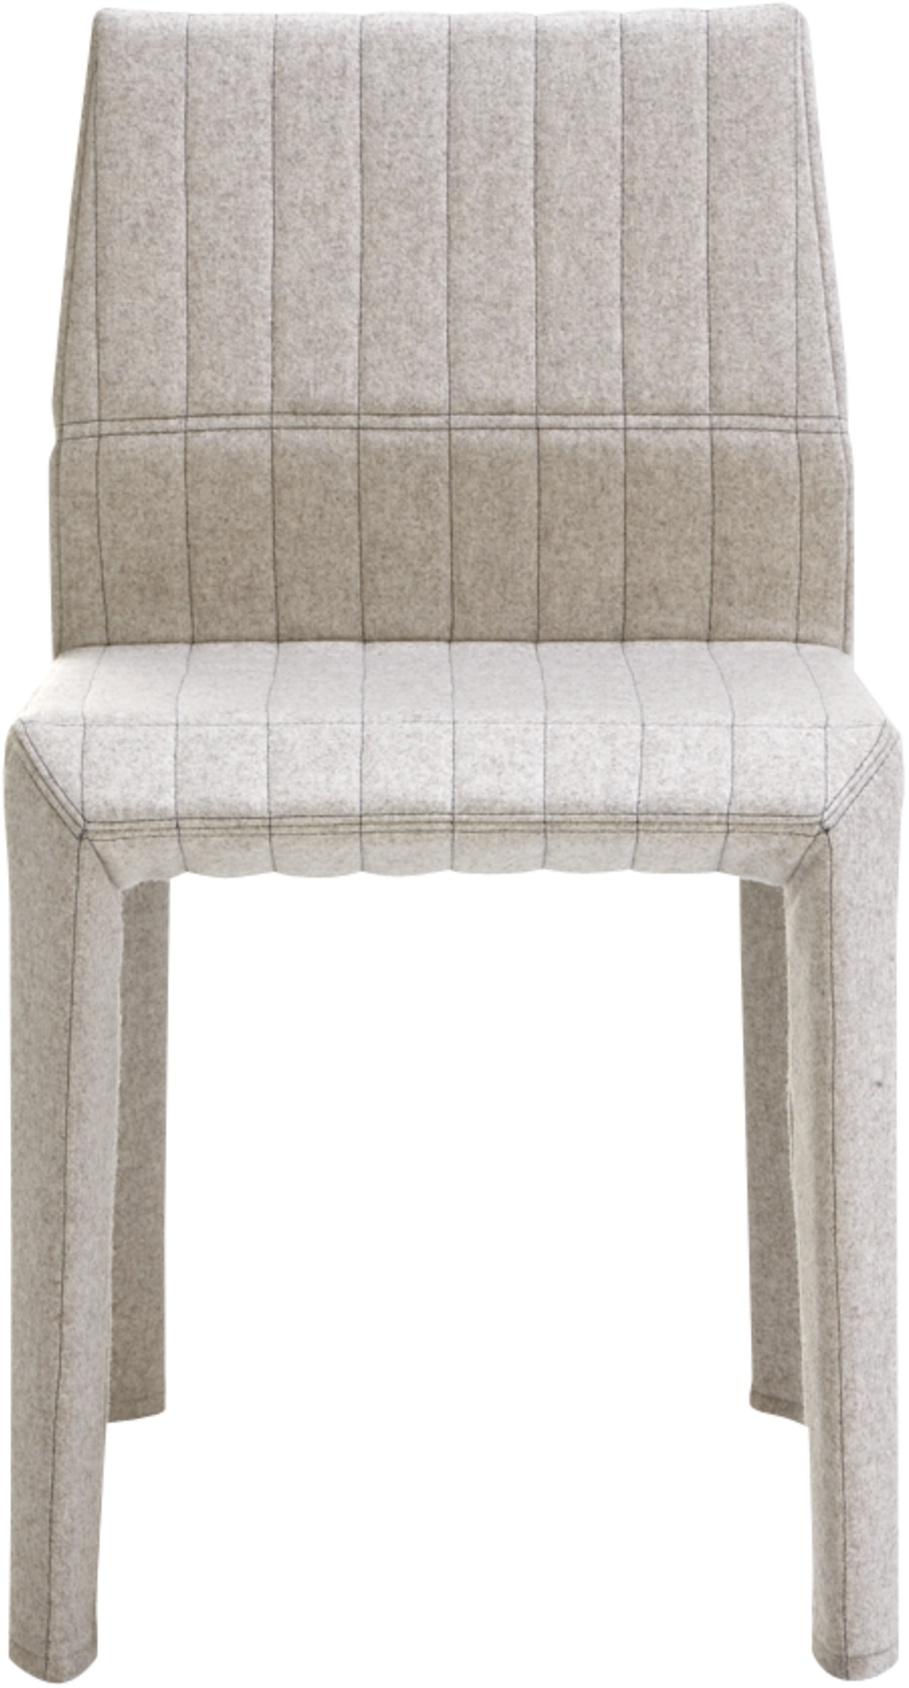 facett chairs designer r e bouroullec ligne roset. Black Bedroom Furniture Sets. Home Design Ideas